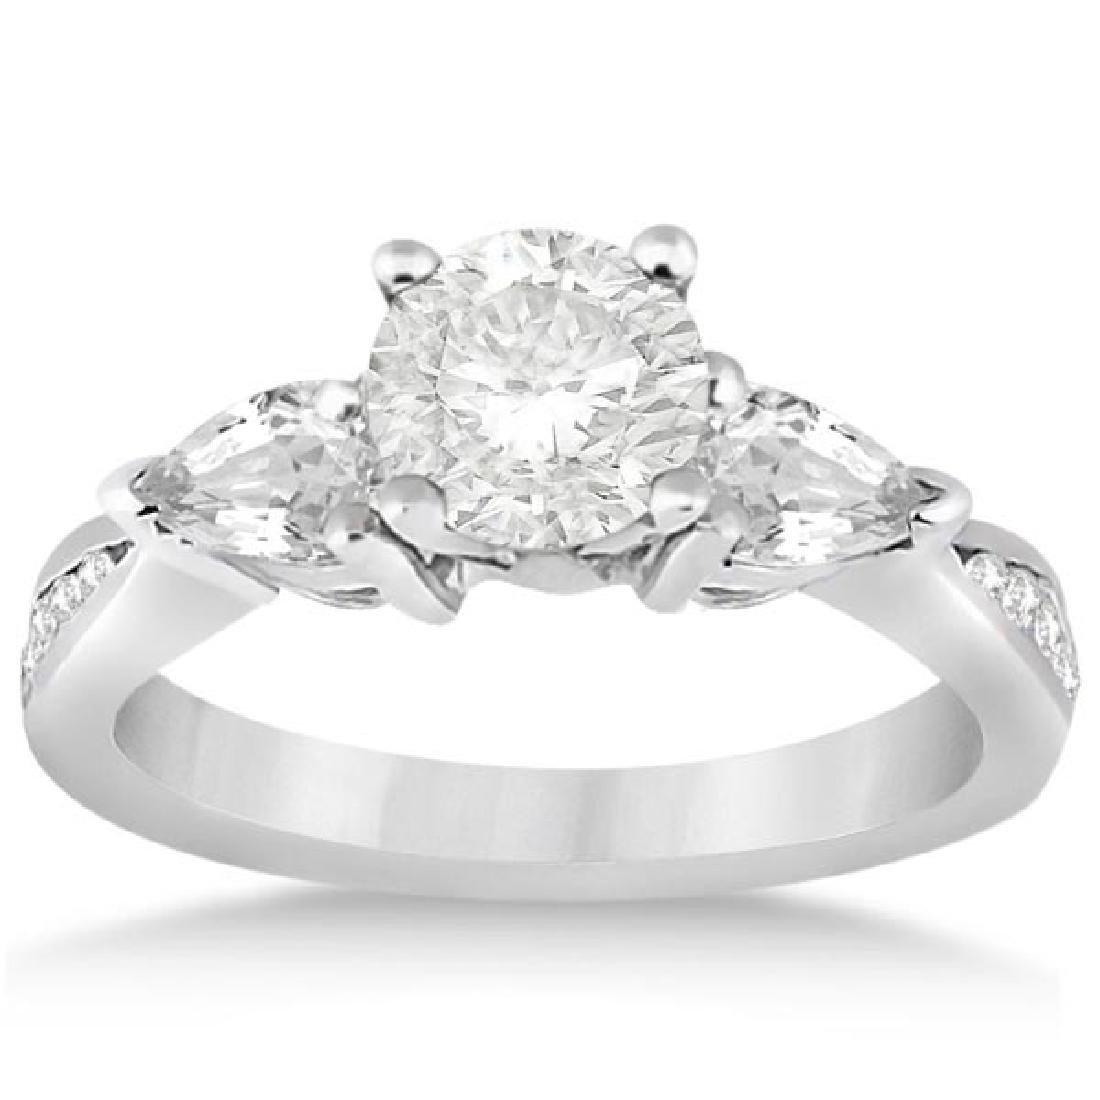 Three Stone Pear Cut Diamond Engagement Ring 14k White